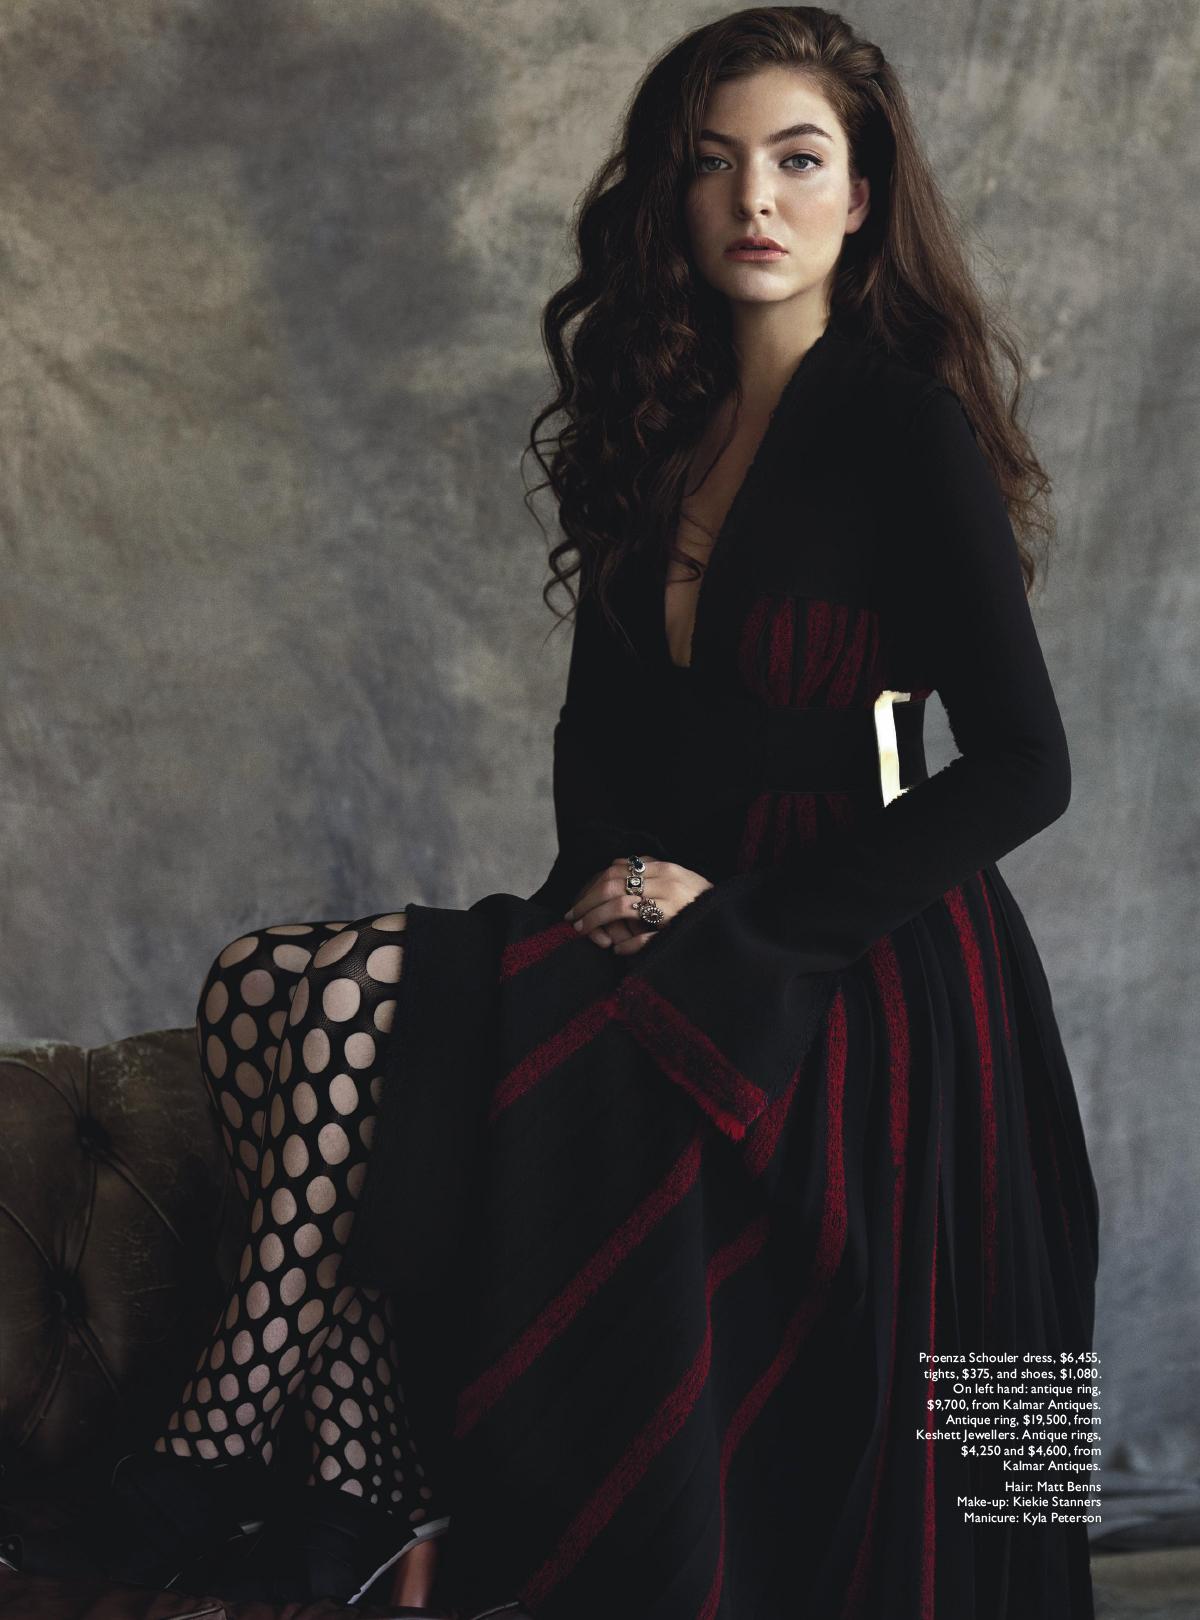 Lorde Vogue Australia July 2015 Lorde Photoshoot 2013